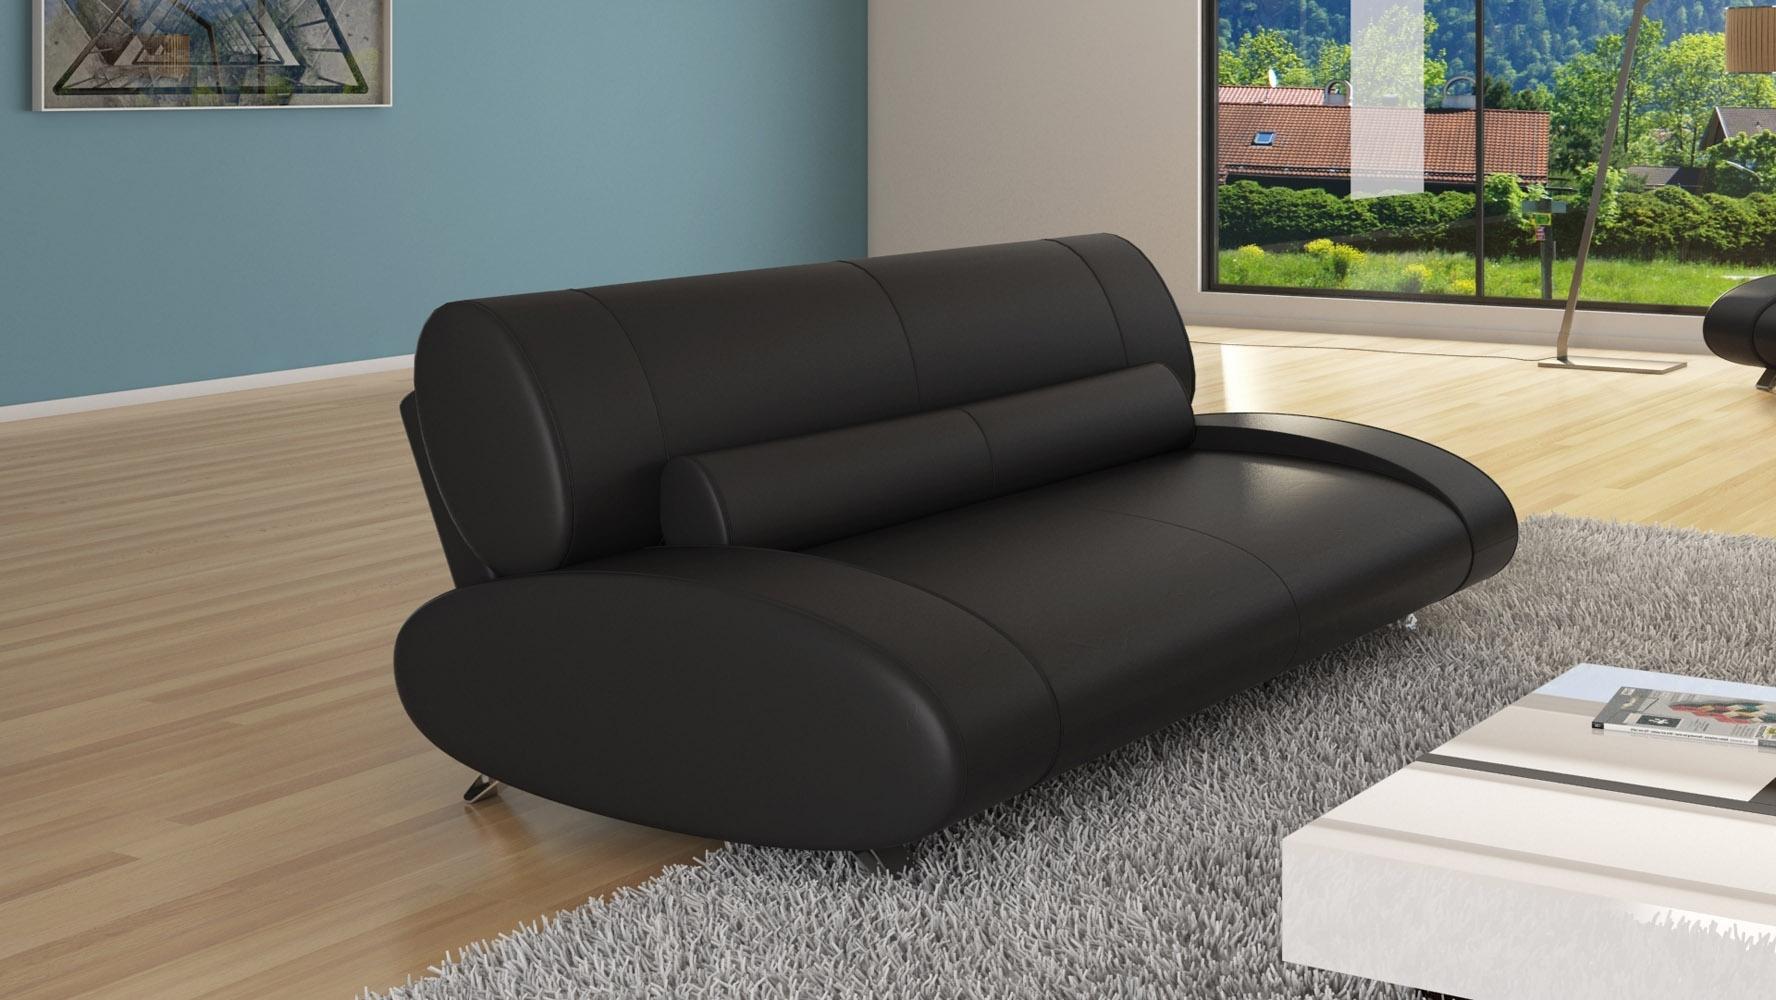 Aspen Leather Sofas In Popular Aspen 3 Seater (View 13 of 20)